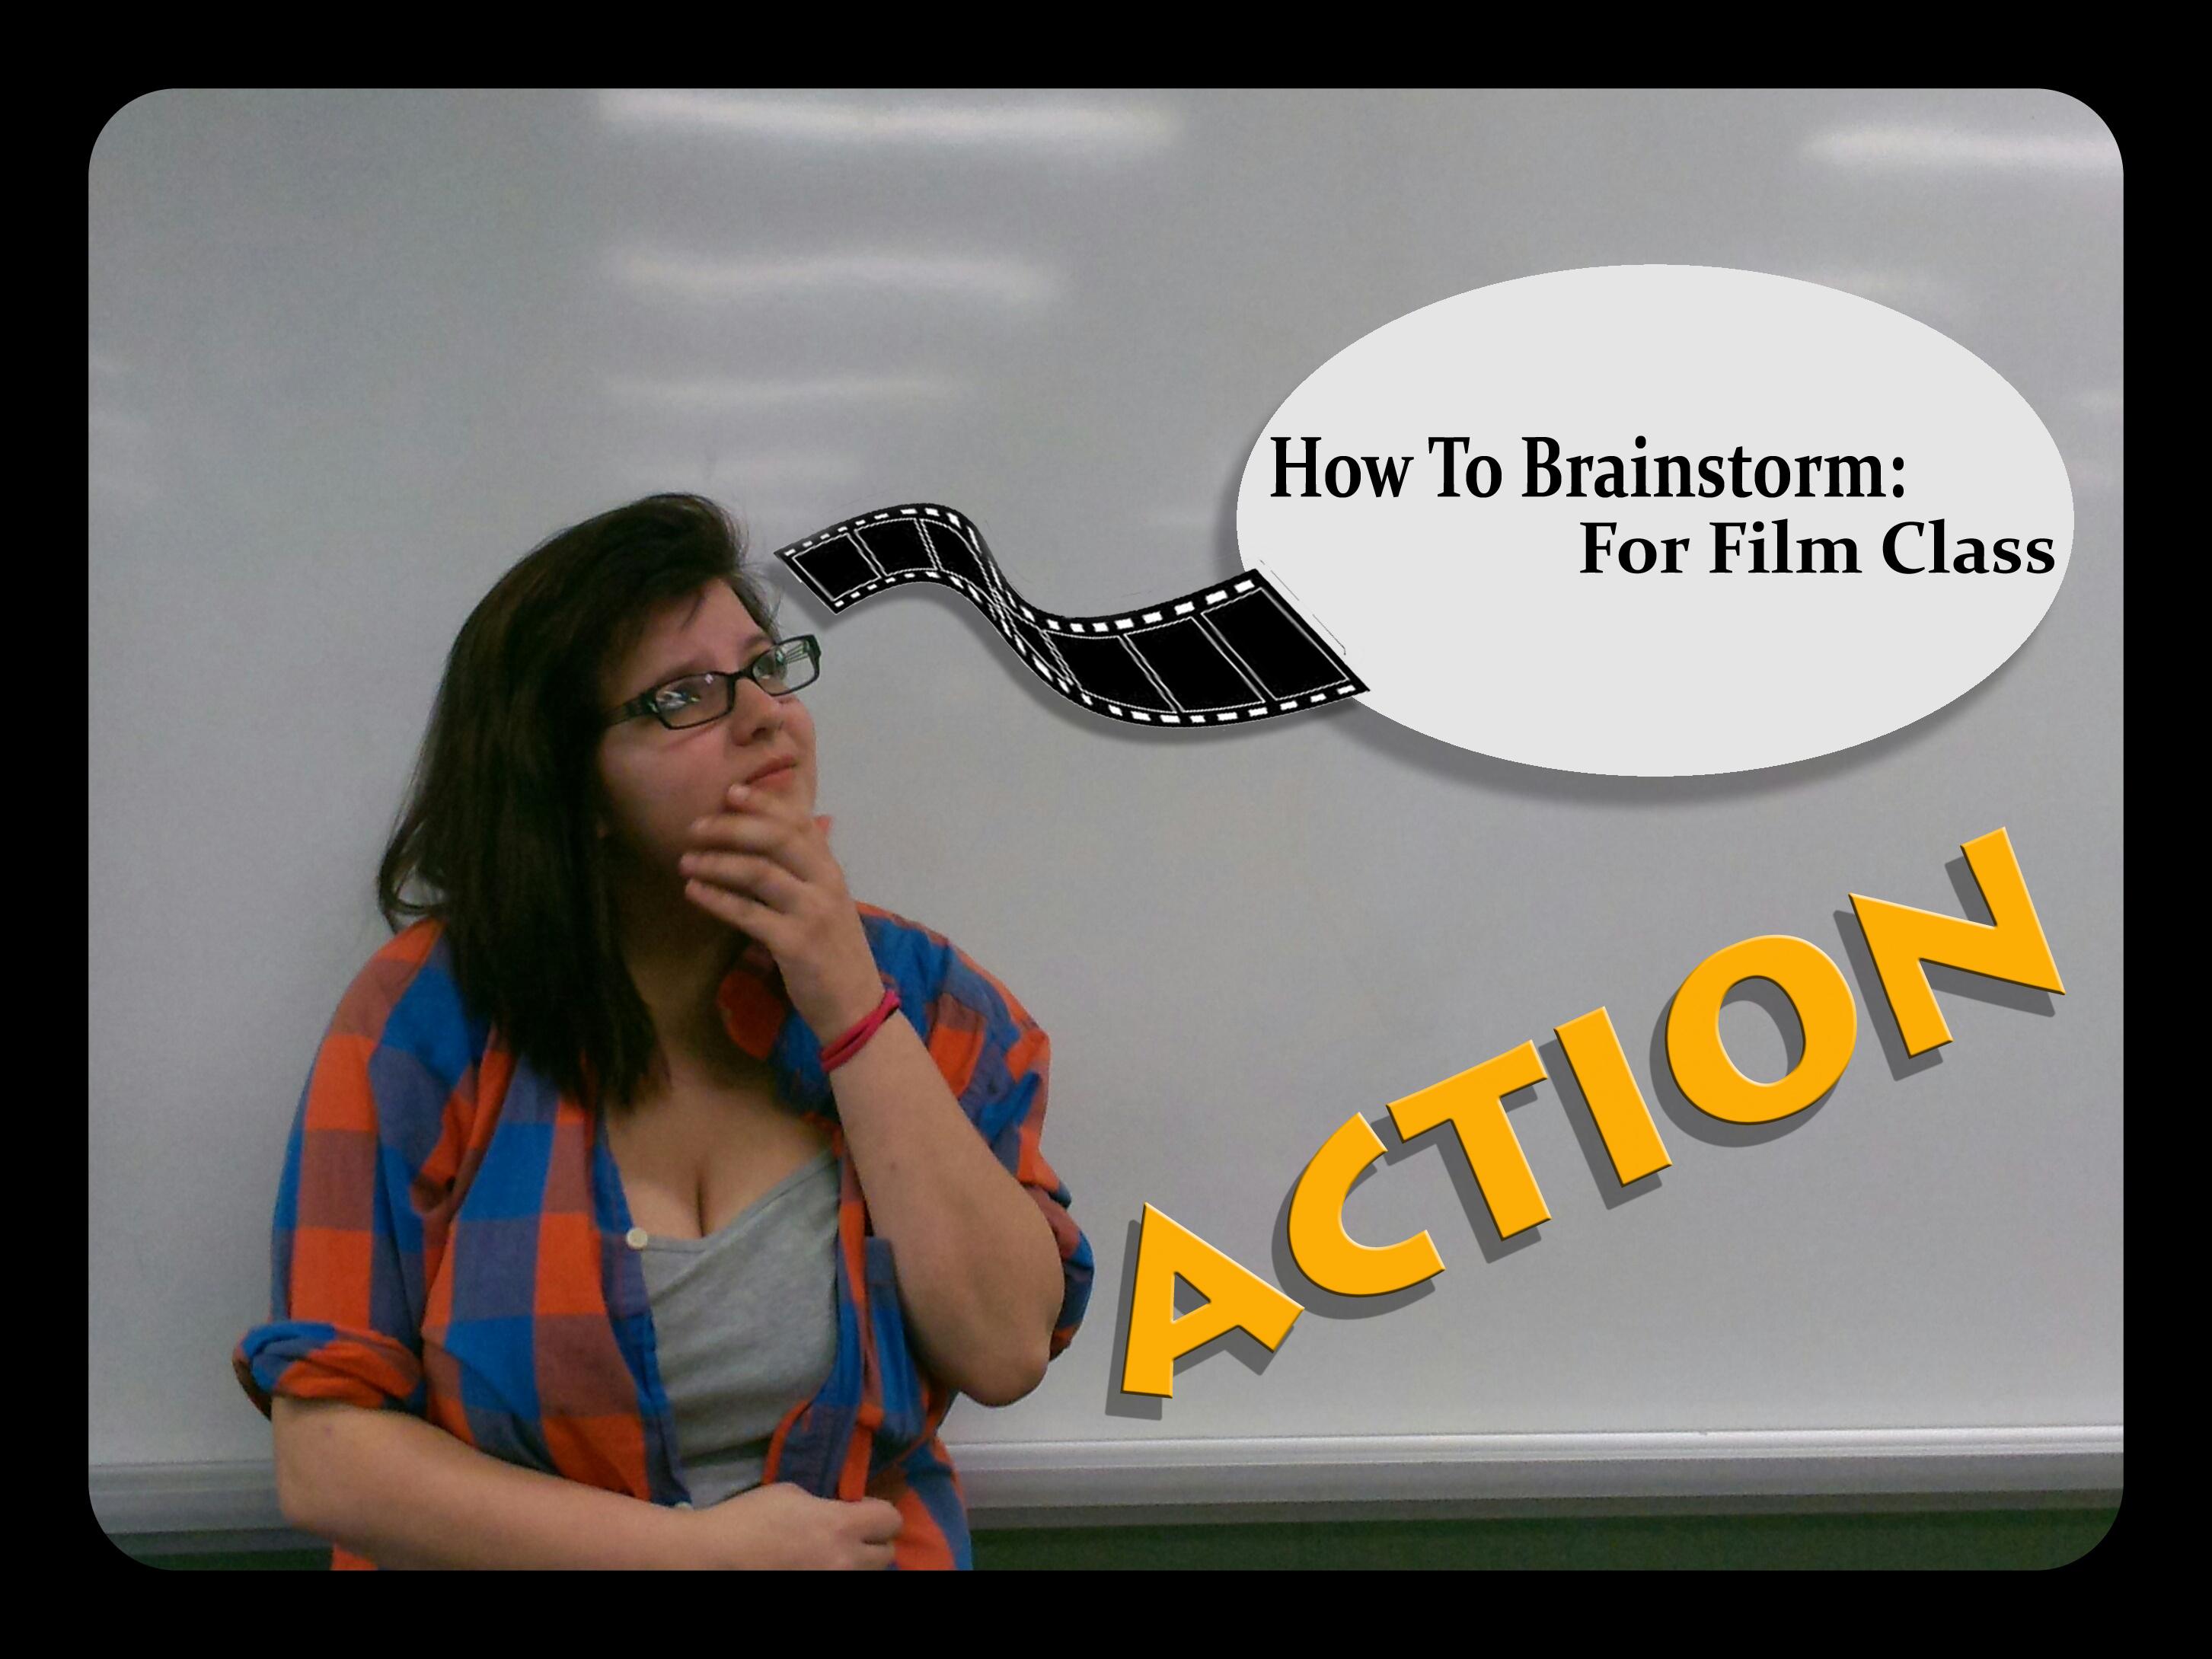 How To Brainstorm An Idea For Film Class